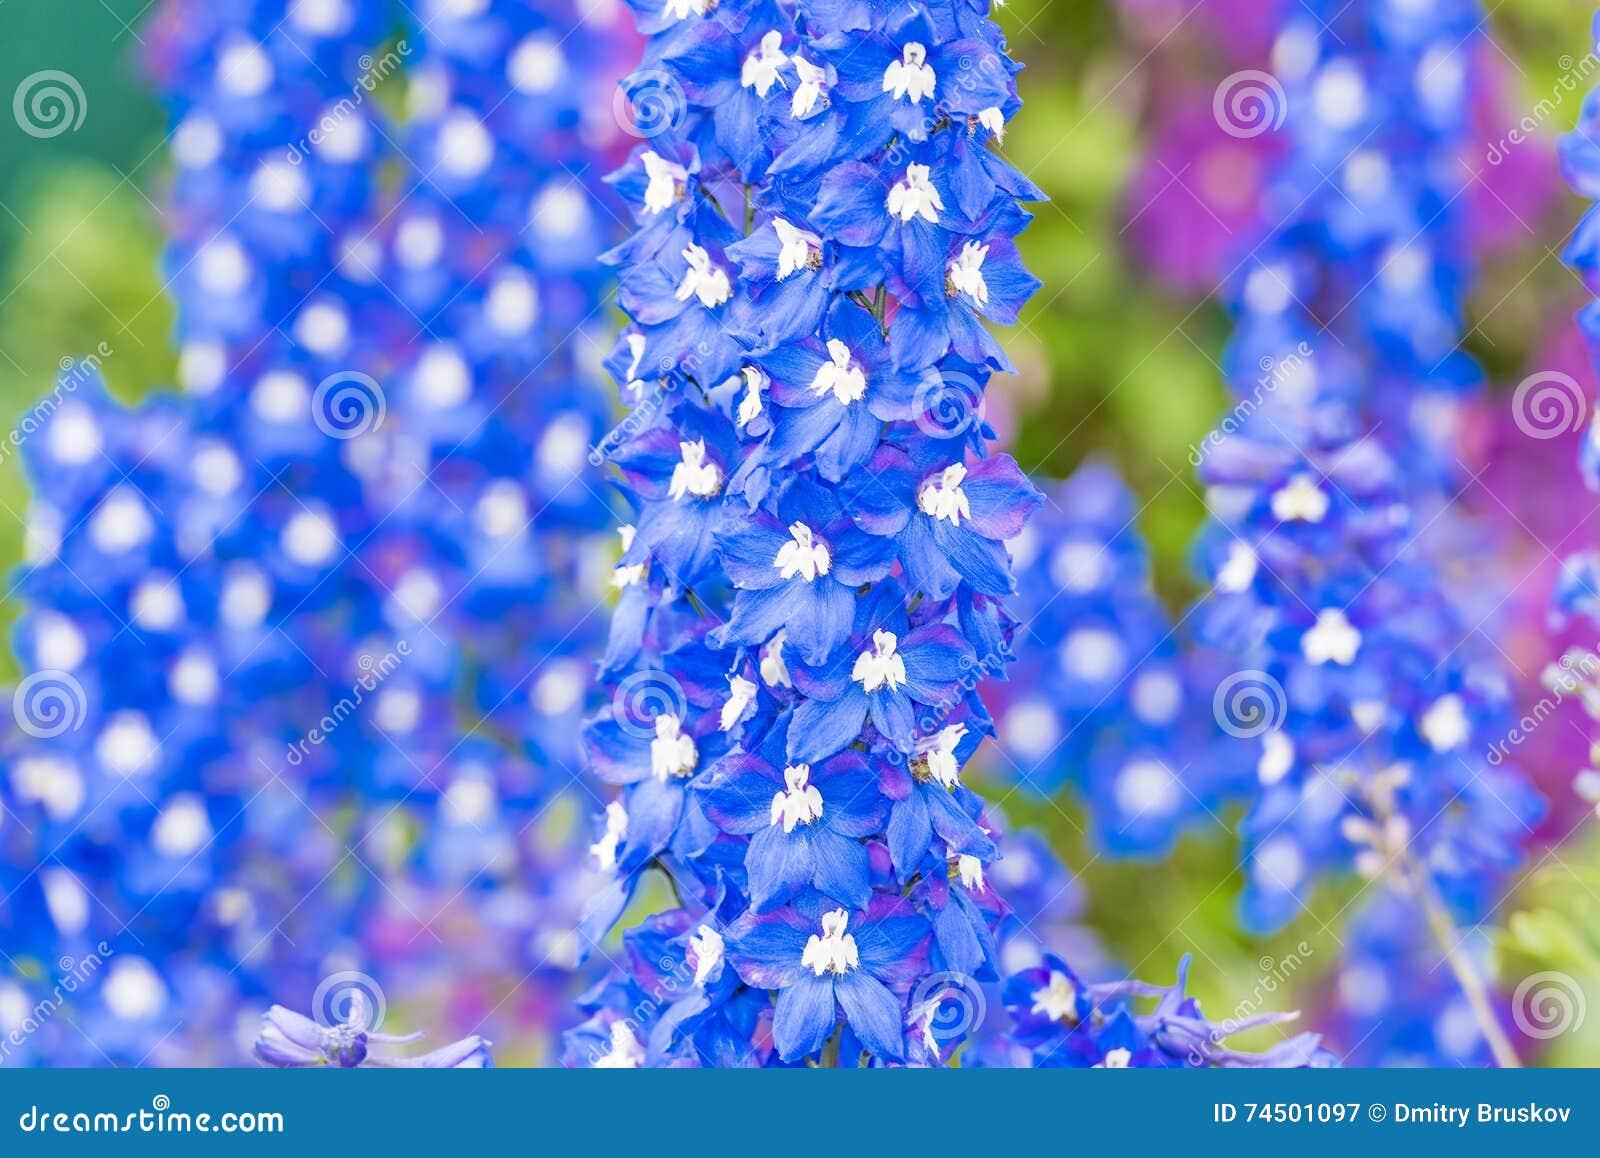 Delphinium Flower In The Garden Stock Image Image Of Ornamental